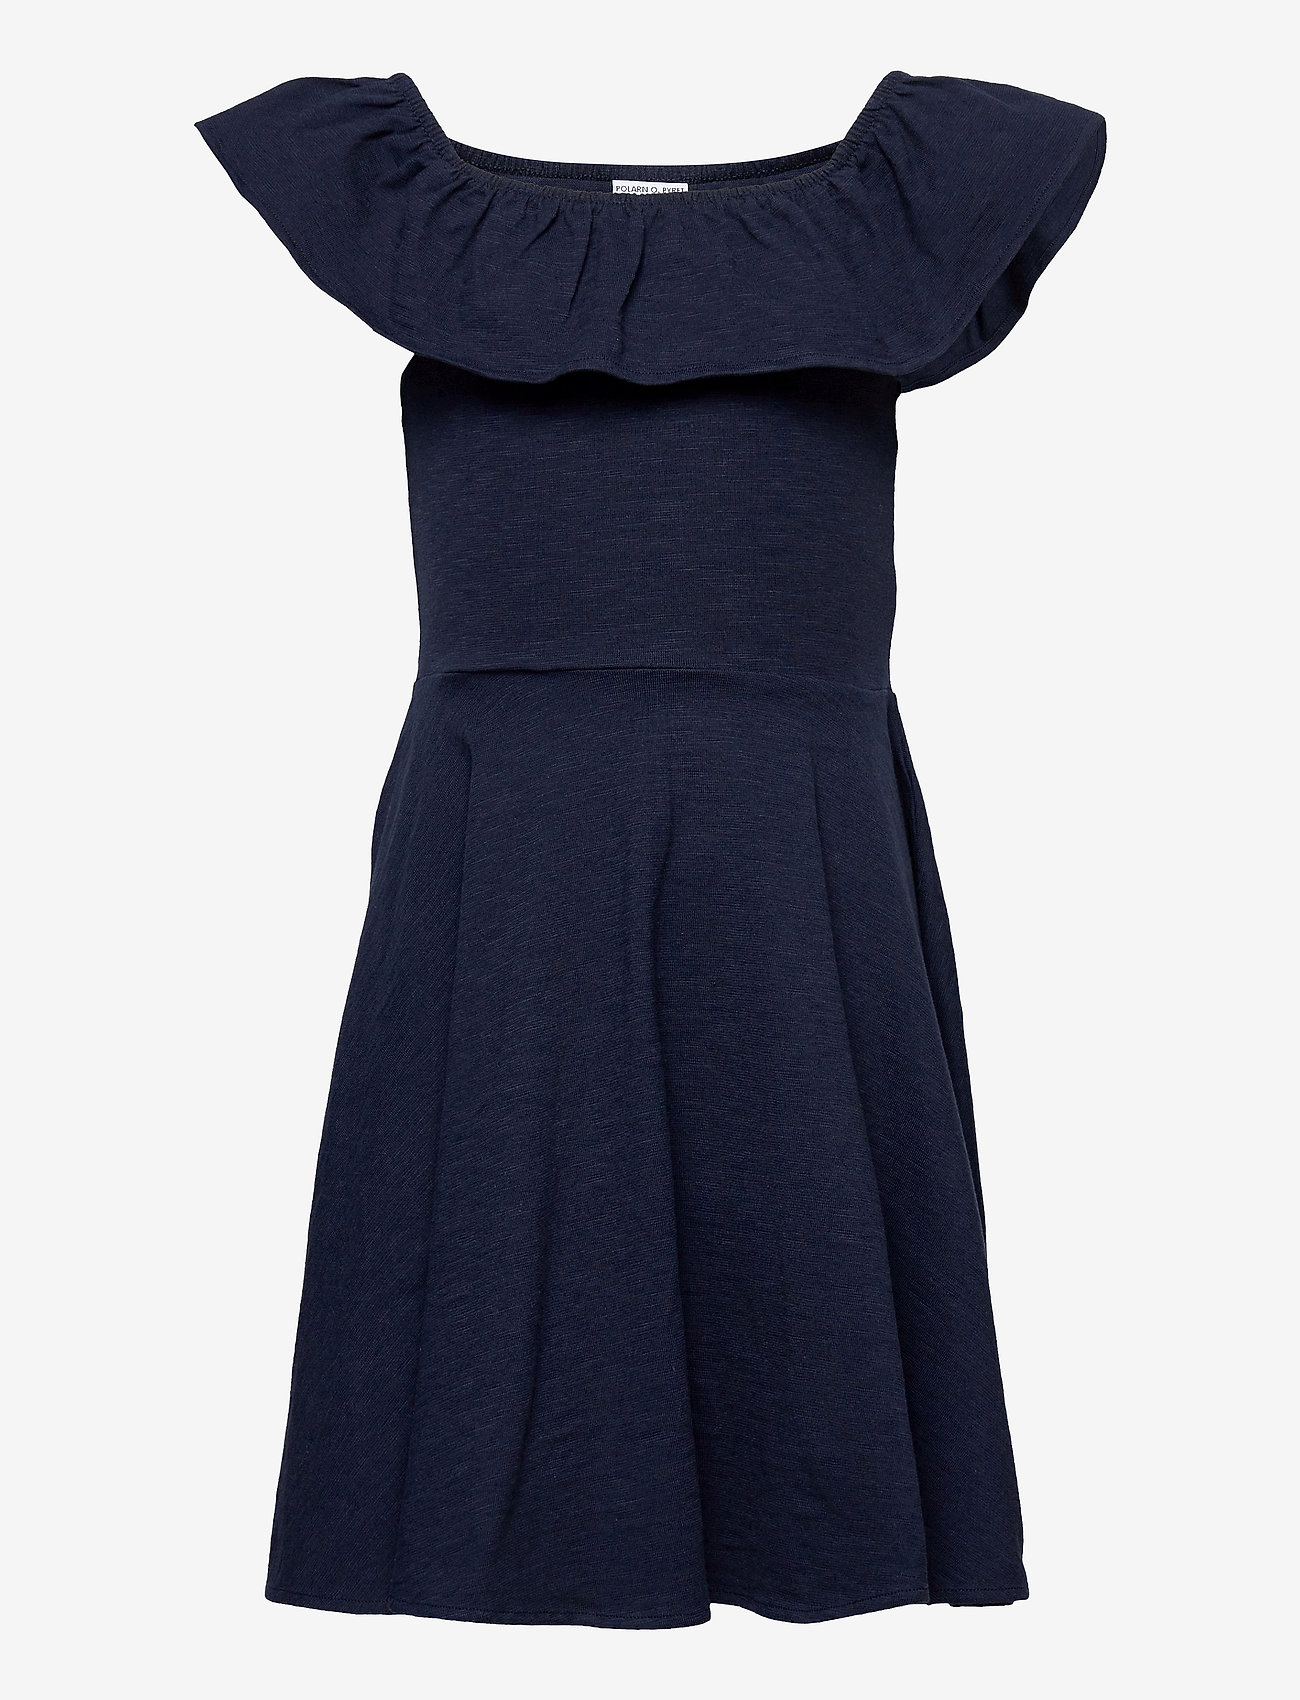 Polarn O. Pyret - Dress Jersey solid s/s School - dark sapphire - 0